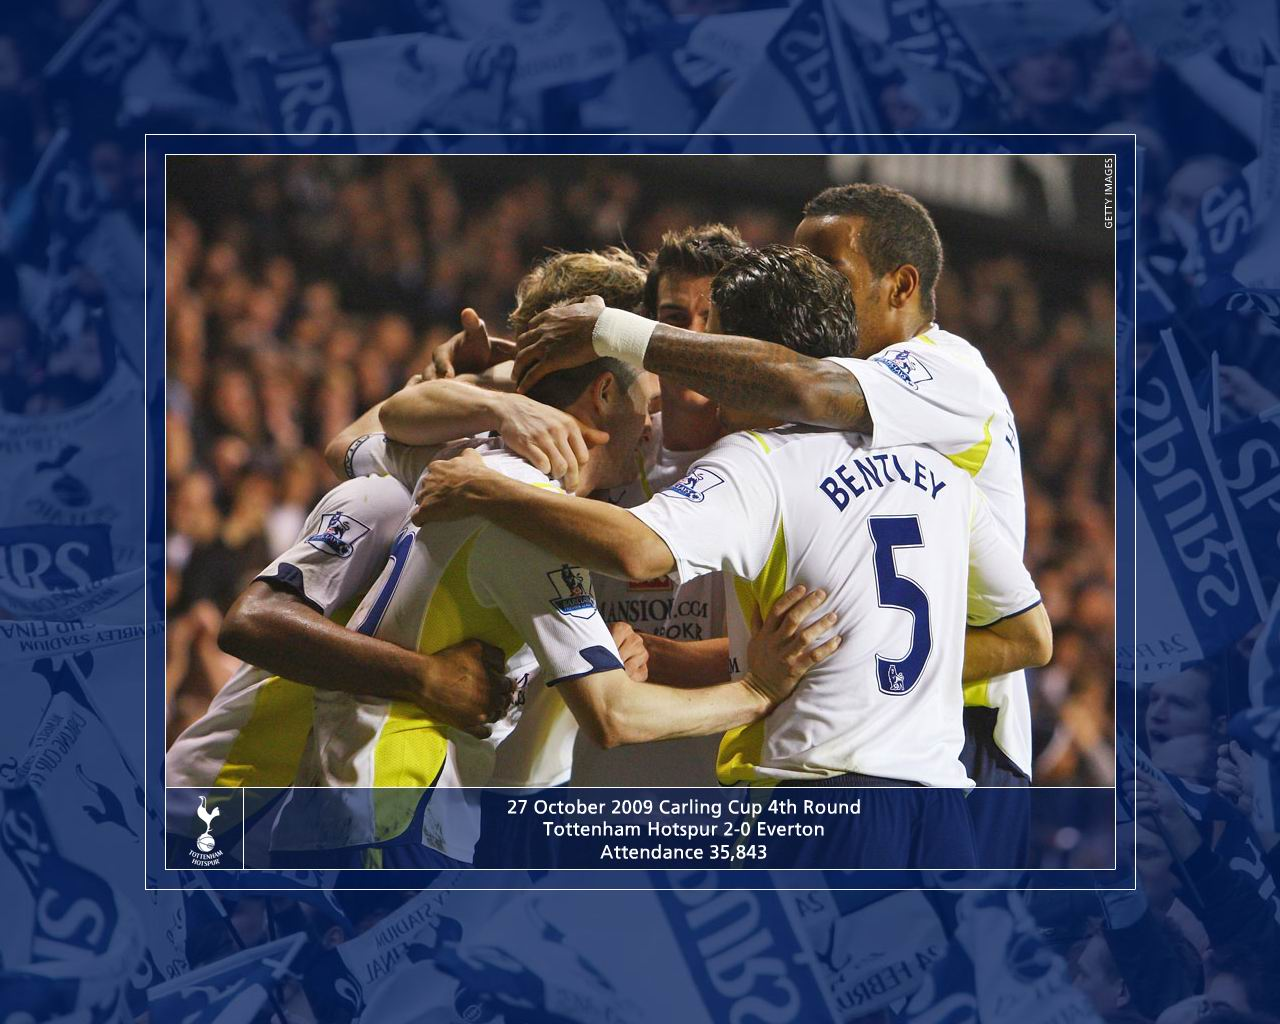 Тоттенхэм Хотспур Tottenham Hotspur